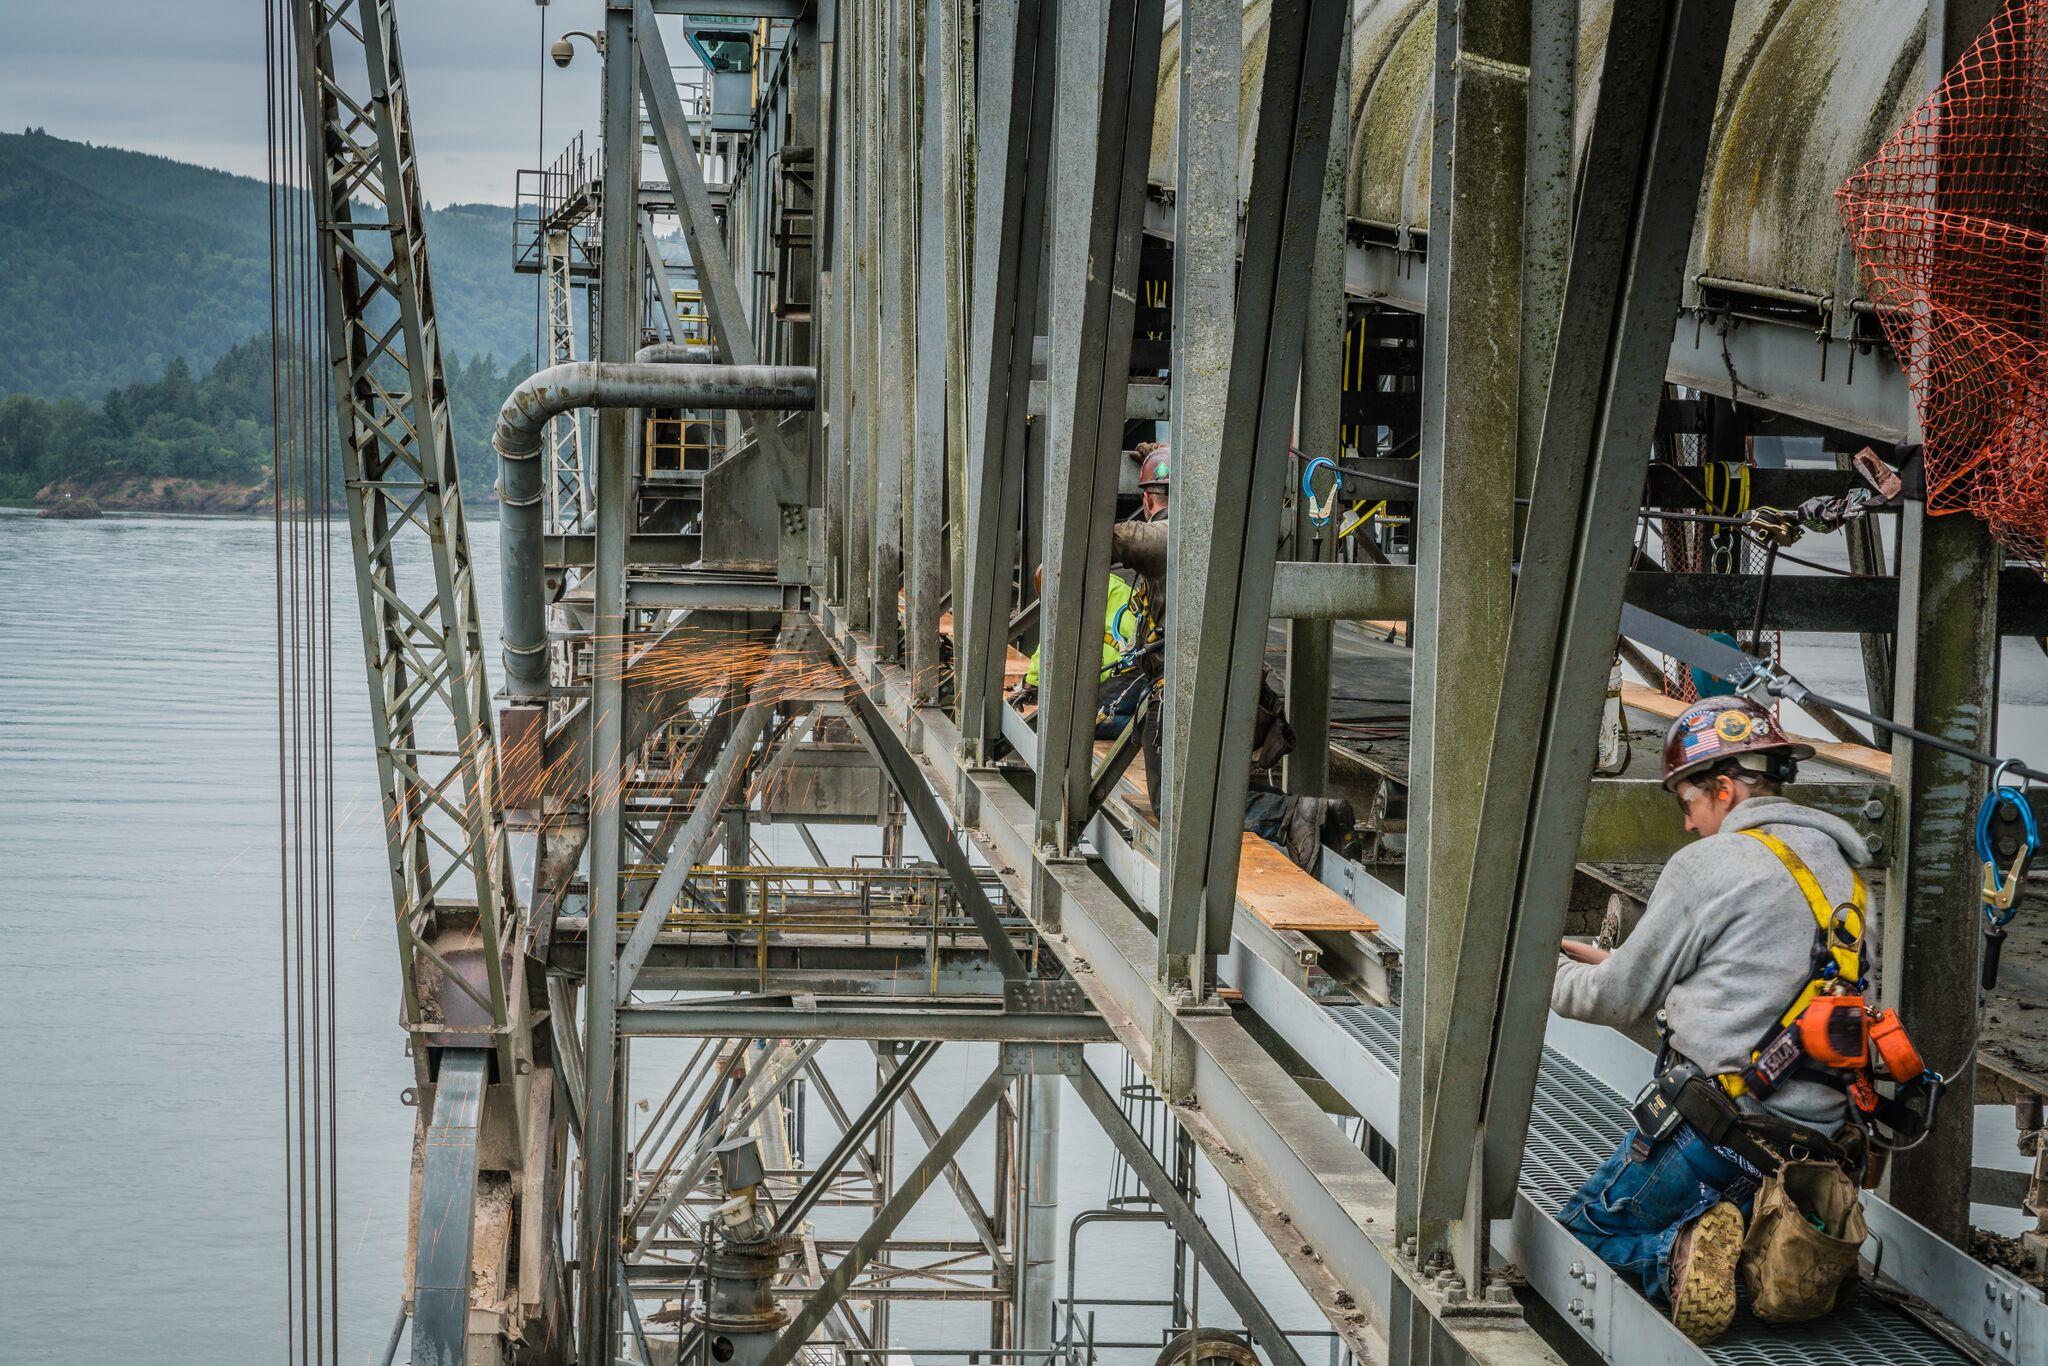 omega morgan millwright crew installing a new catwalk on a ship loader